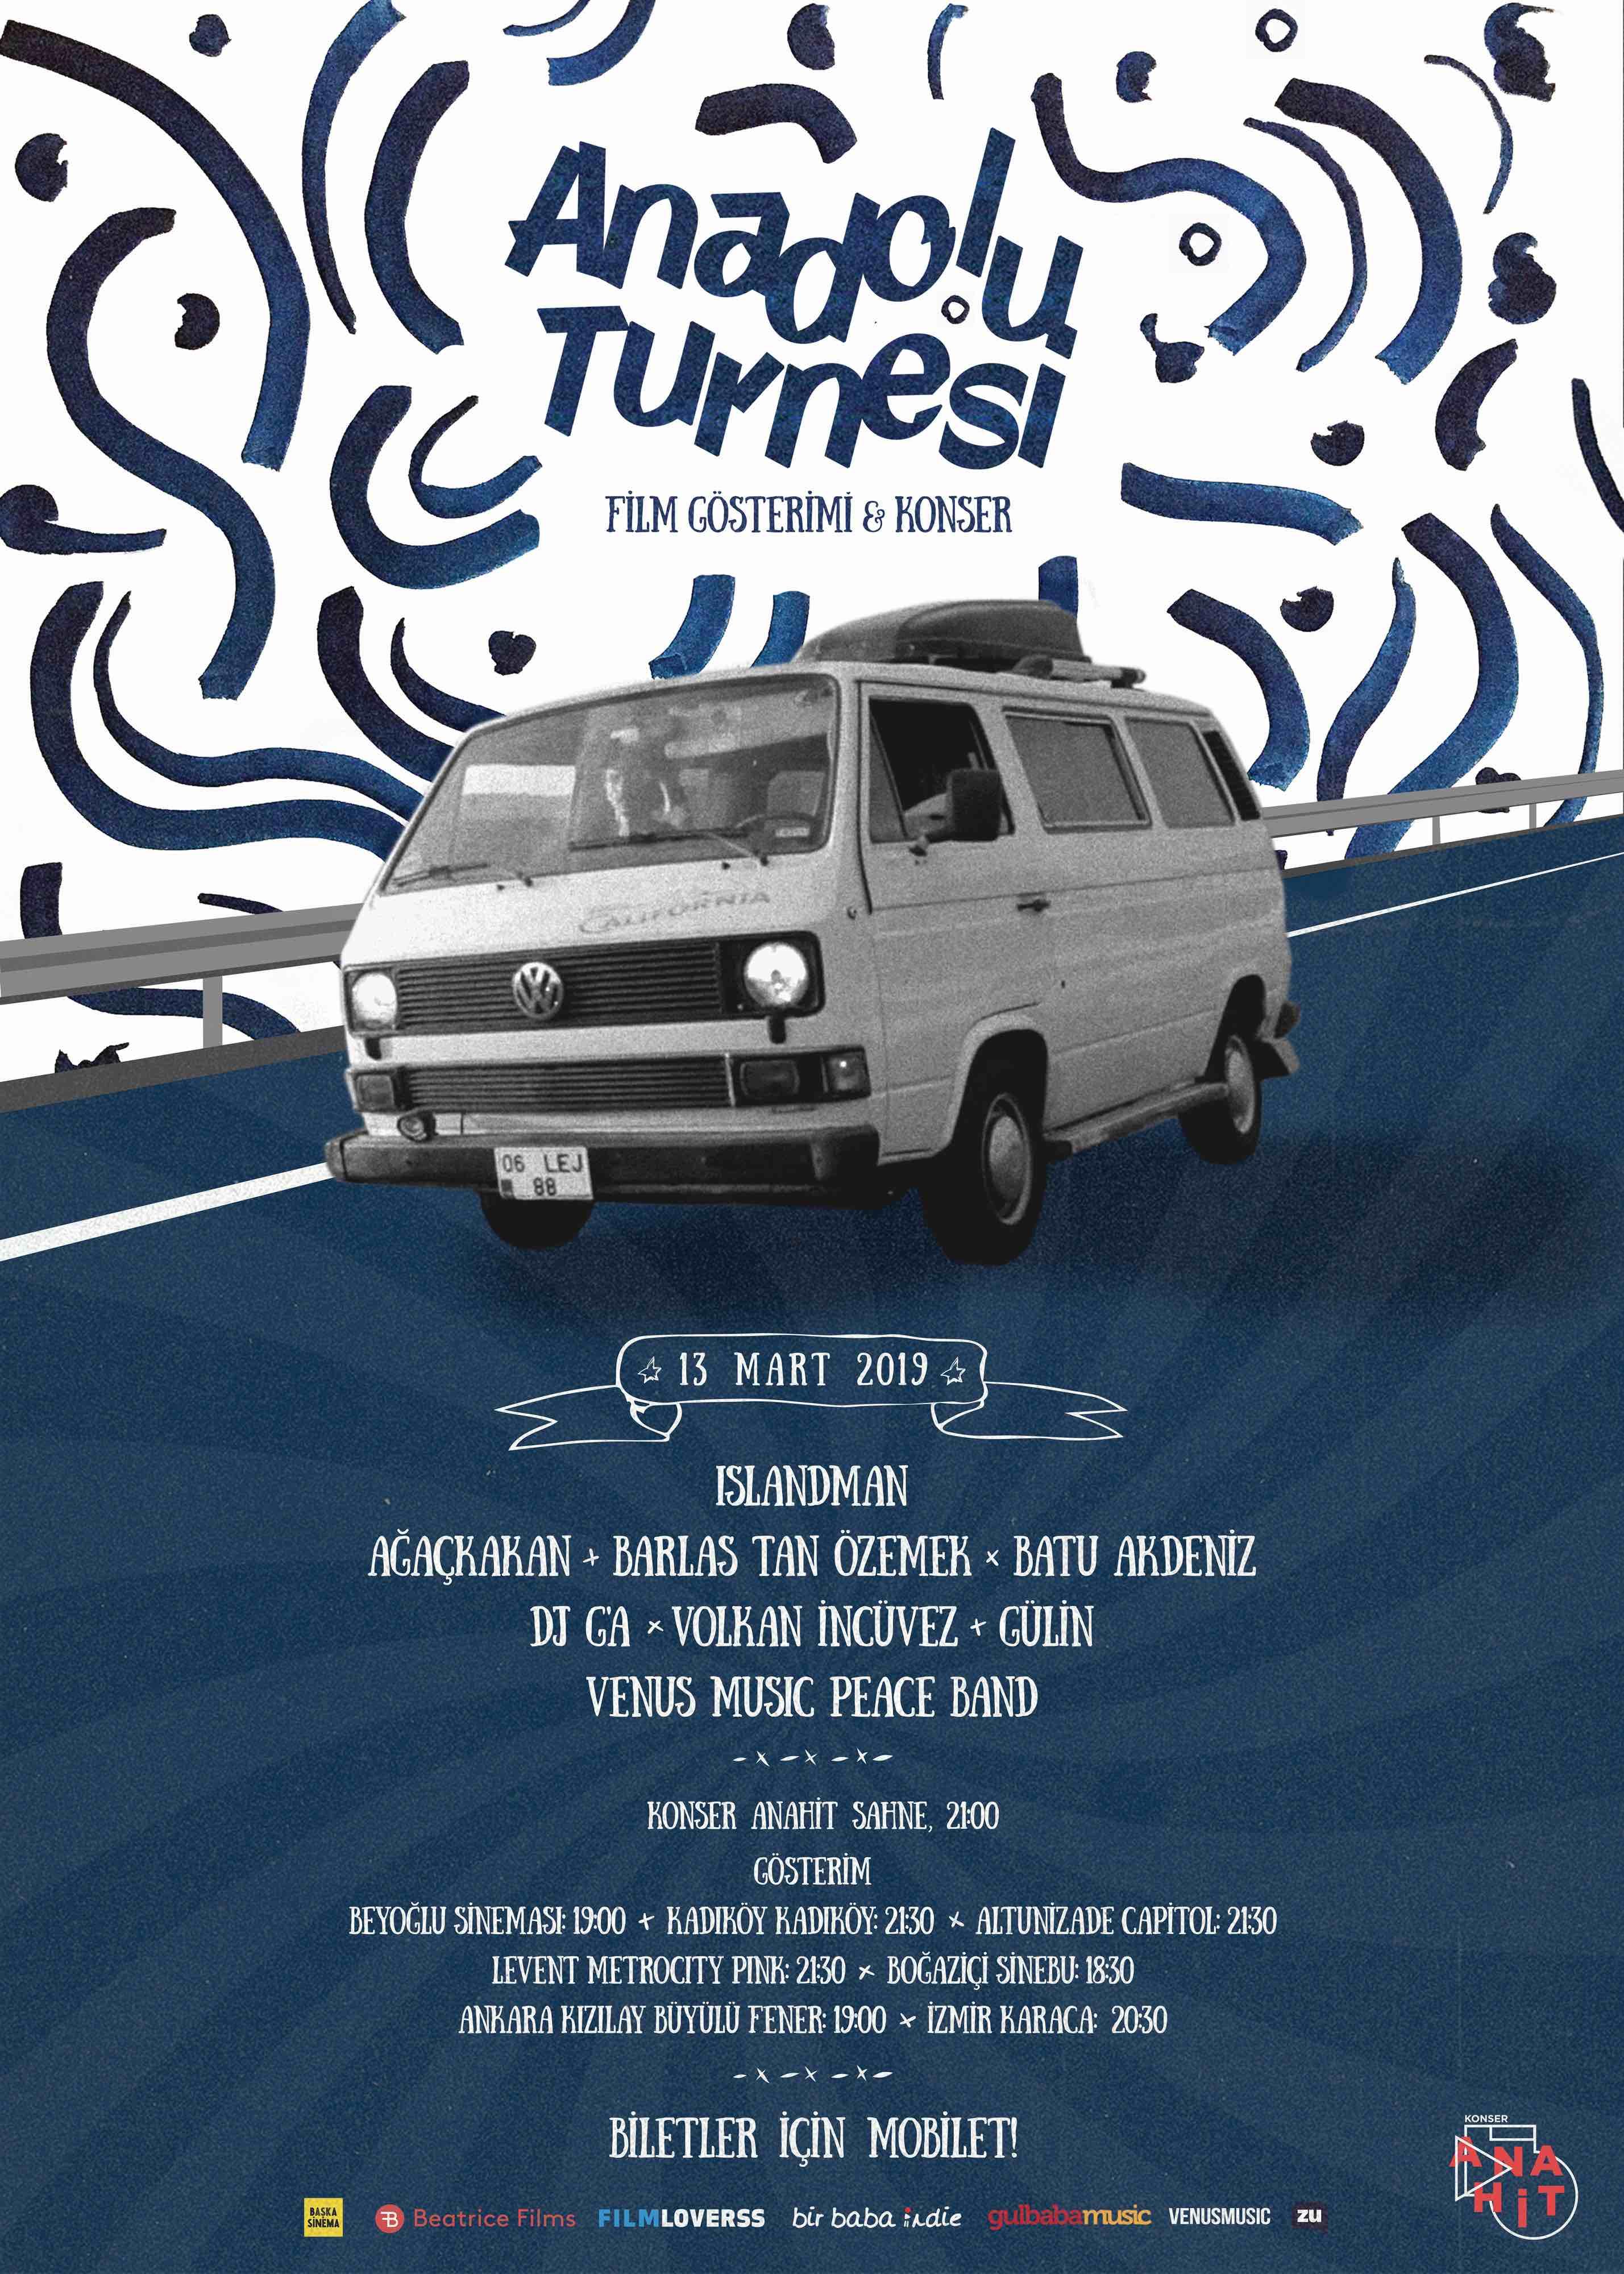 Anadolu Turnesi - 13 Mart Film & Konser